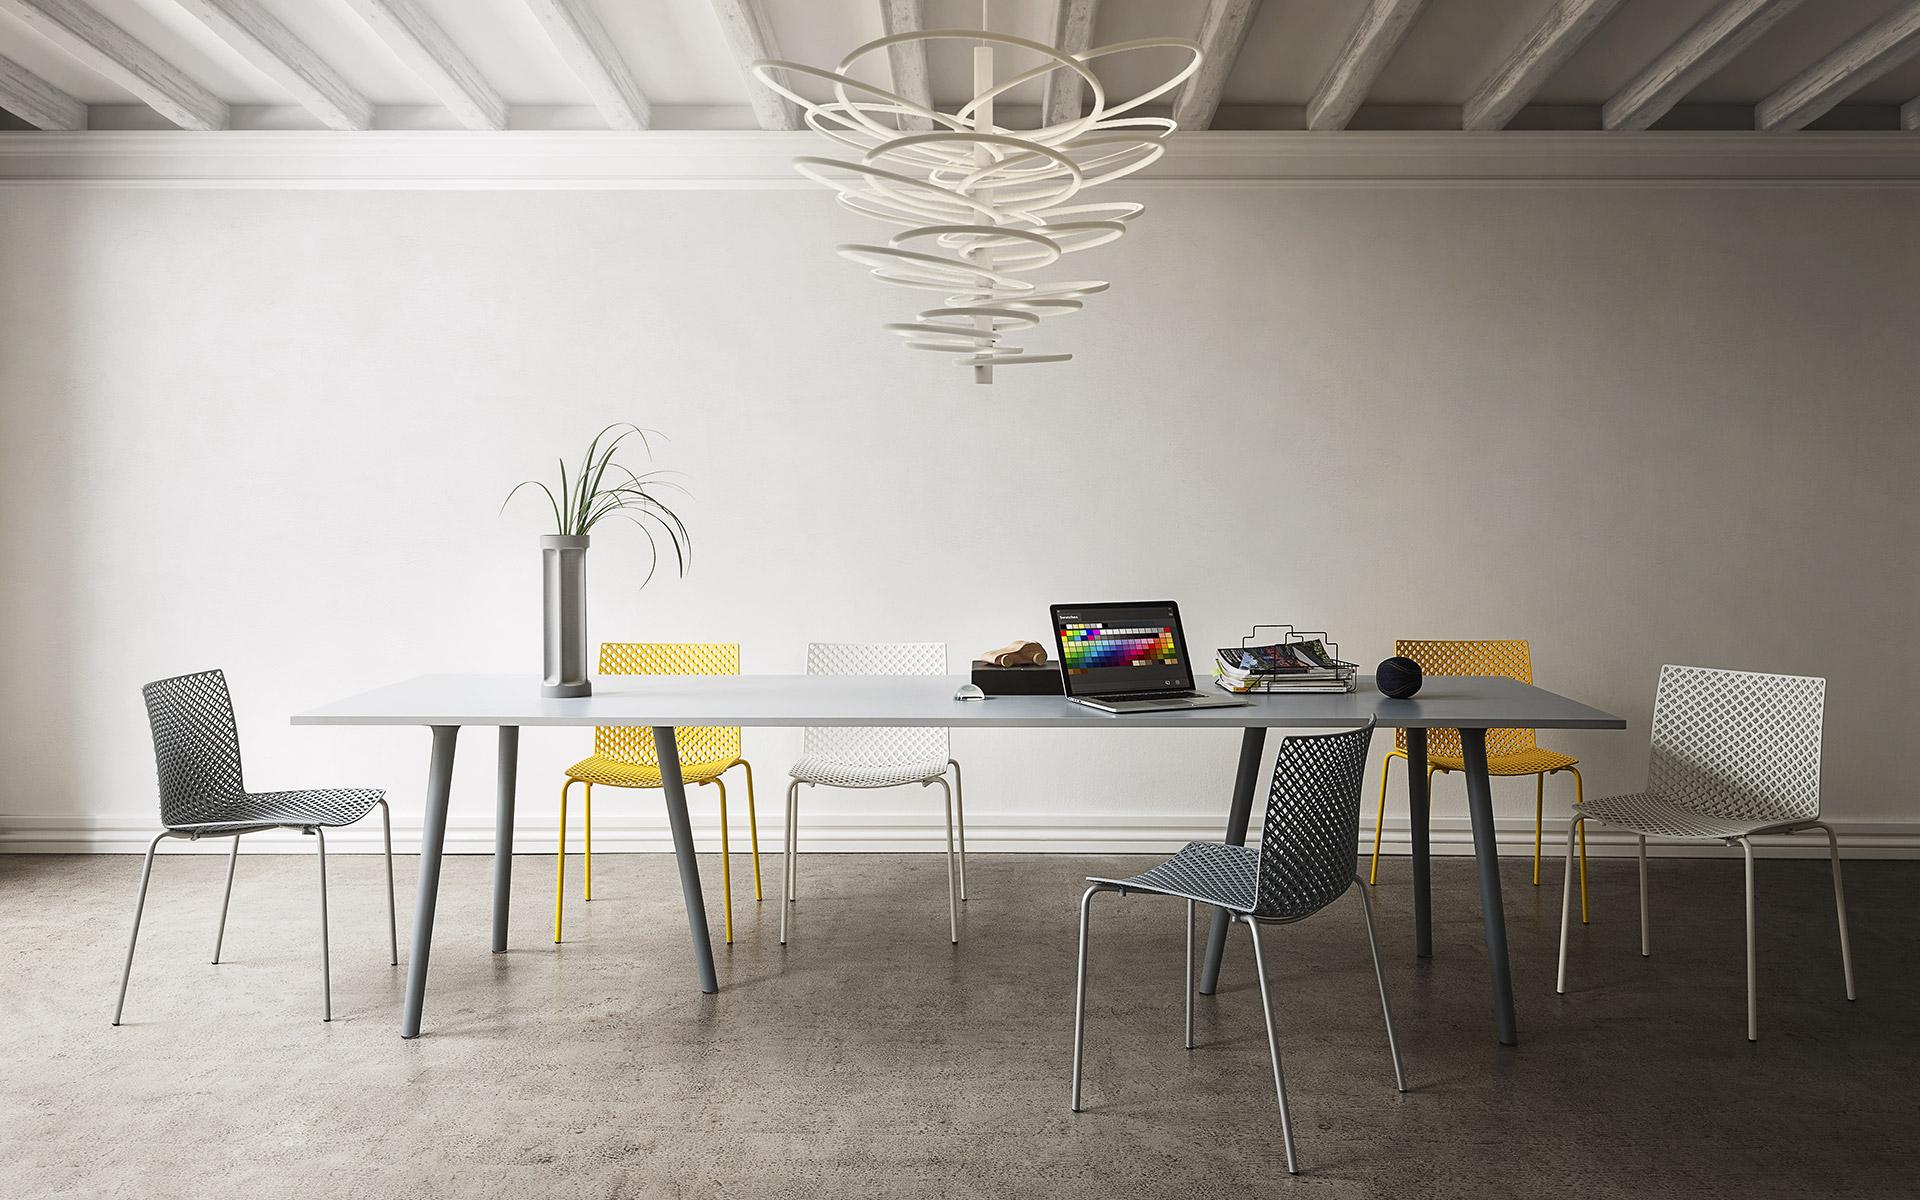 Sgabelli Cucina Verdi : Sedie sedie imbottite sgabelli sgabelli imbottiti tavoli